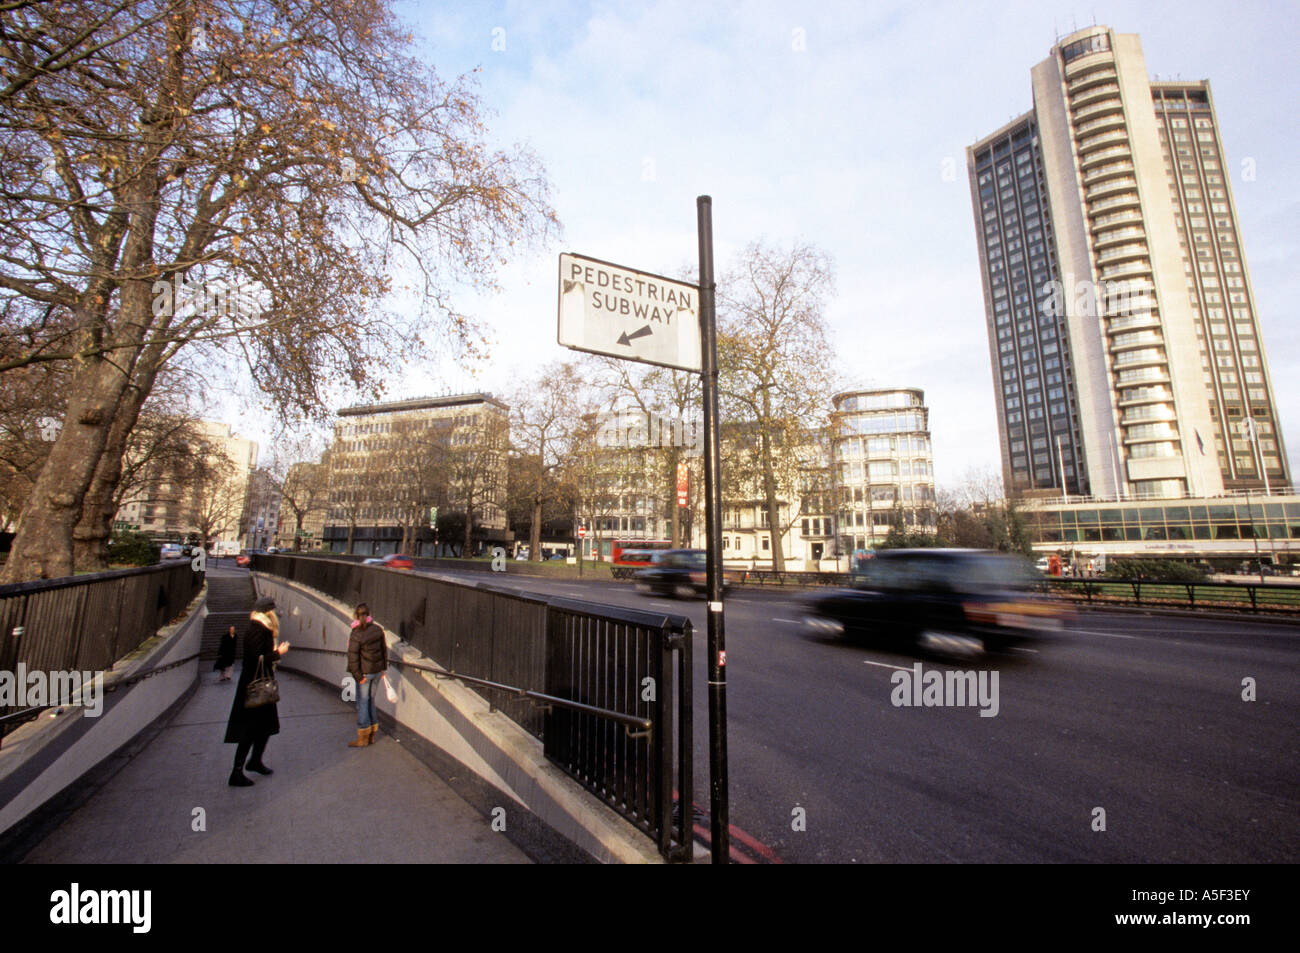 Street scene of Old Park Lane London - Stock Image